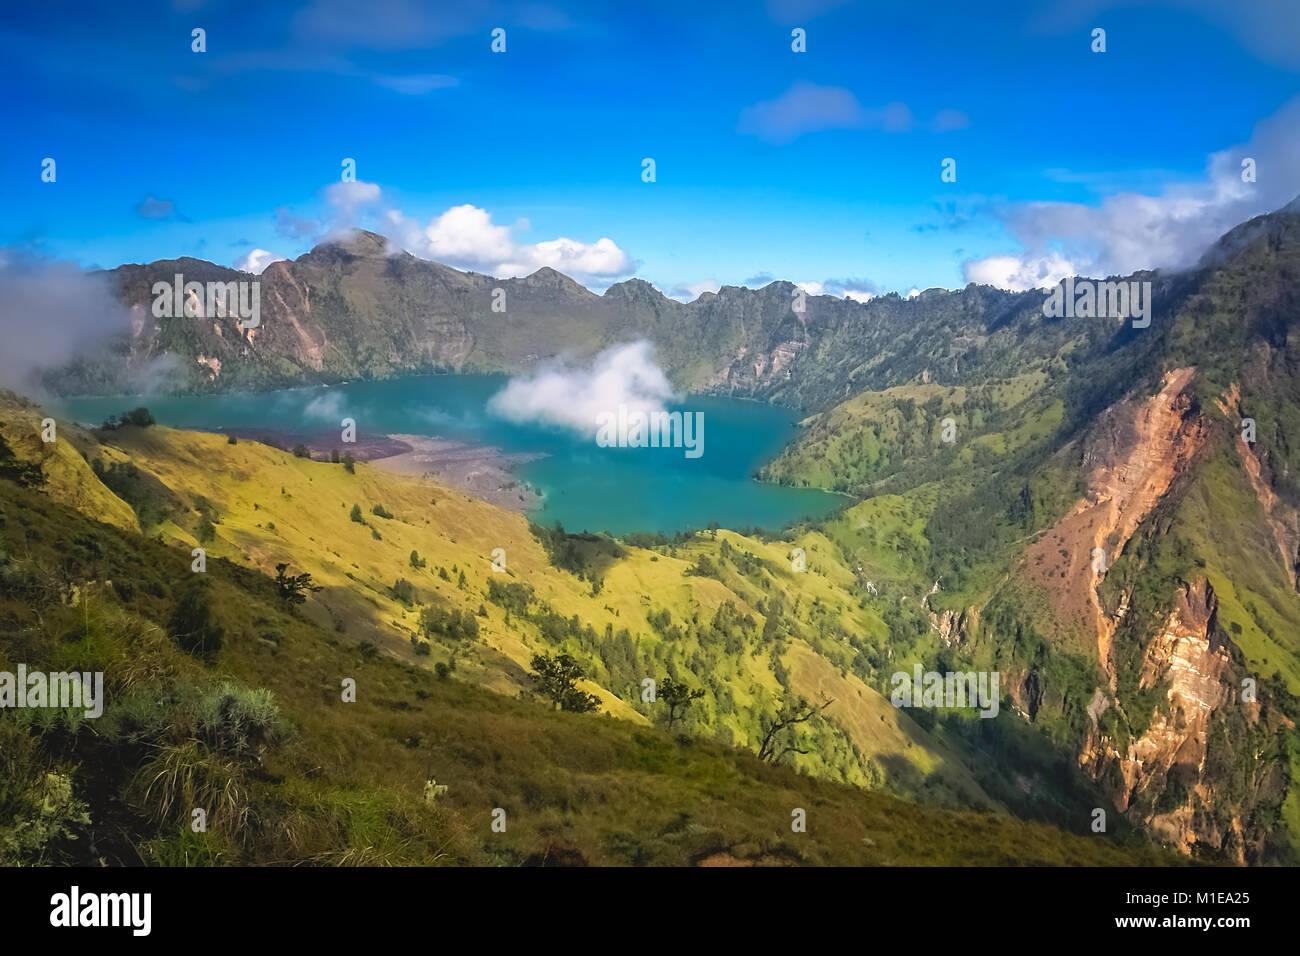 Torquise See innerhalb der Caldera des Gunung Rinjani Vulkan in Lombok, Indonesien Stockbild